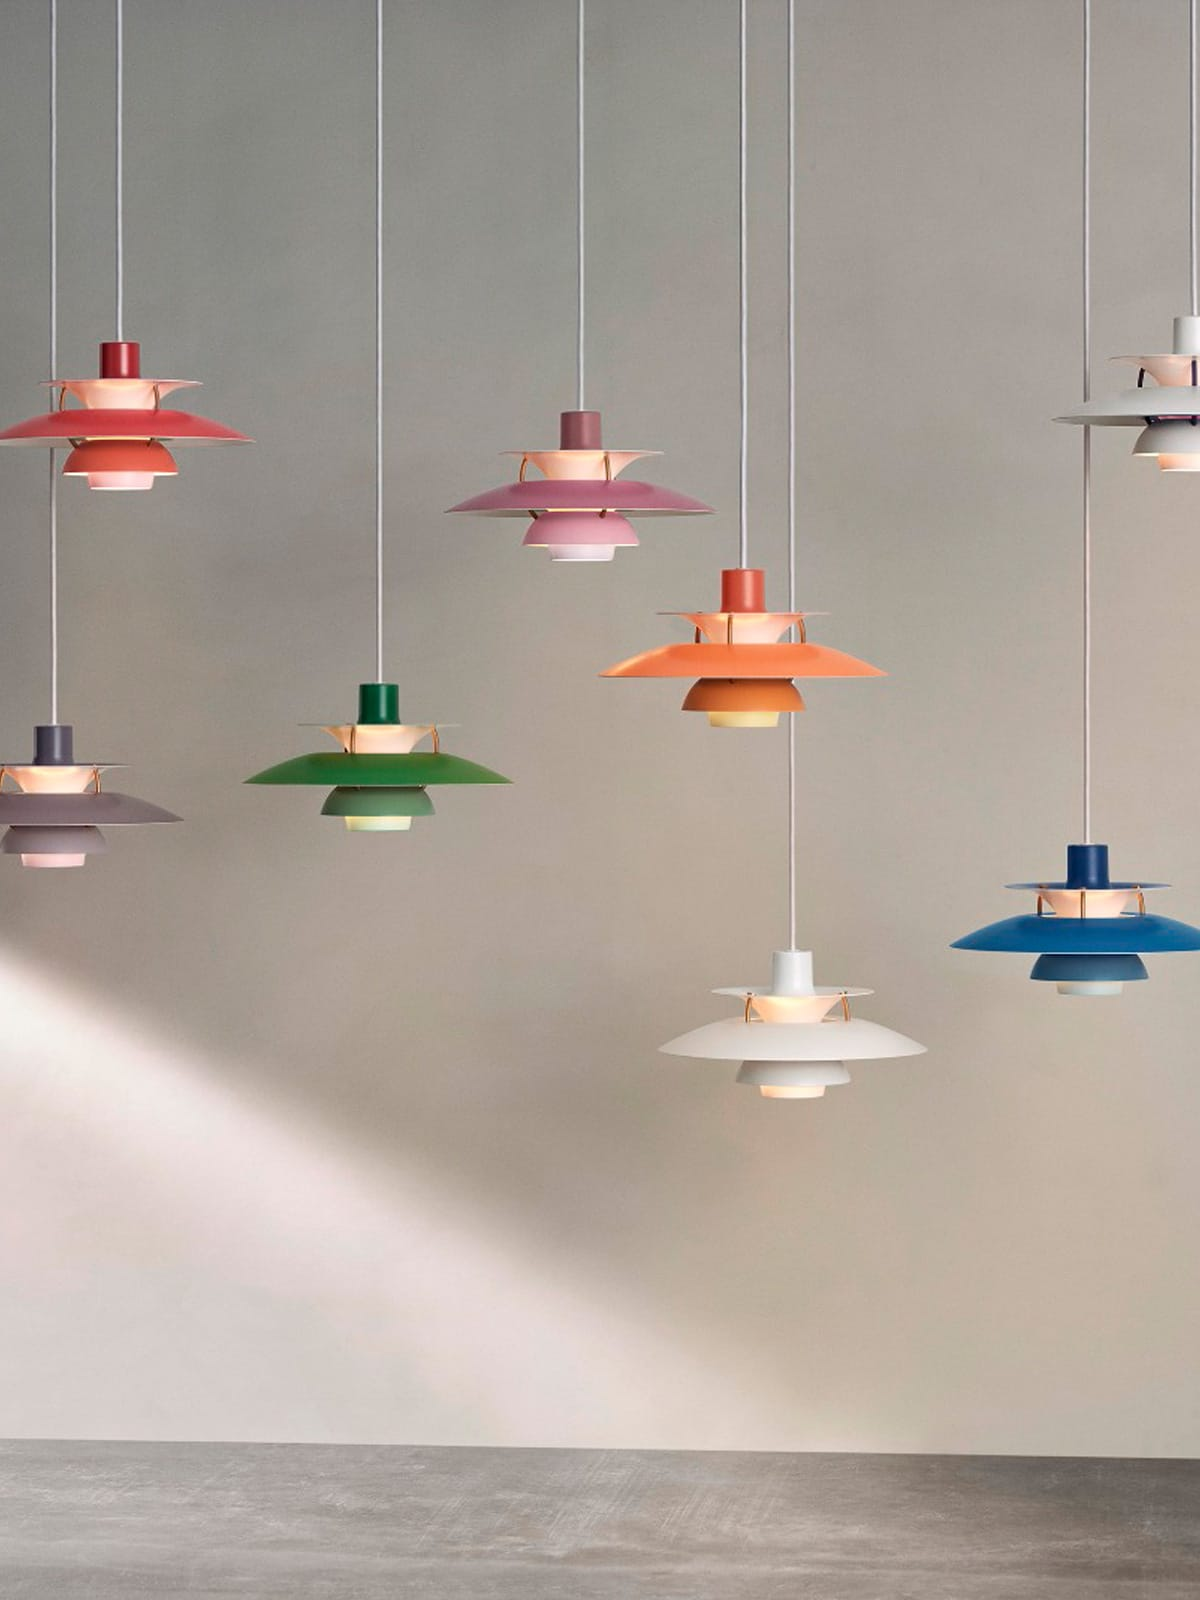 PH5 Mini - Lampen Leuchten Designerleuchten Online Berlin Design